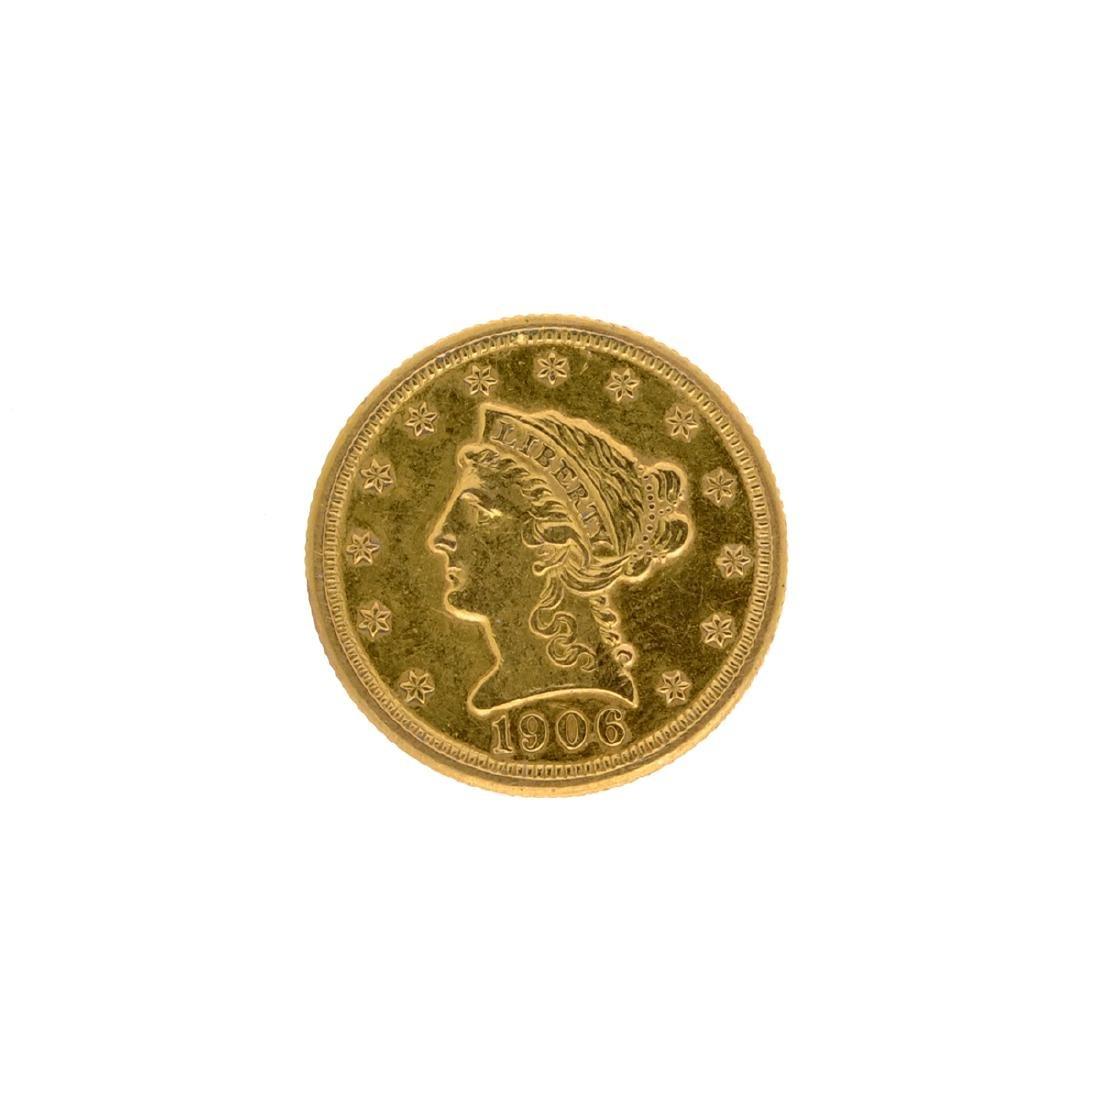 1906 $2.50 U.S. Liberty Head Gold Coin